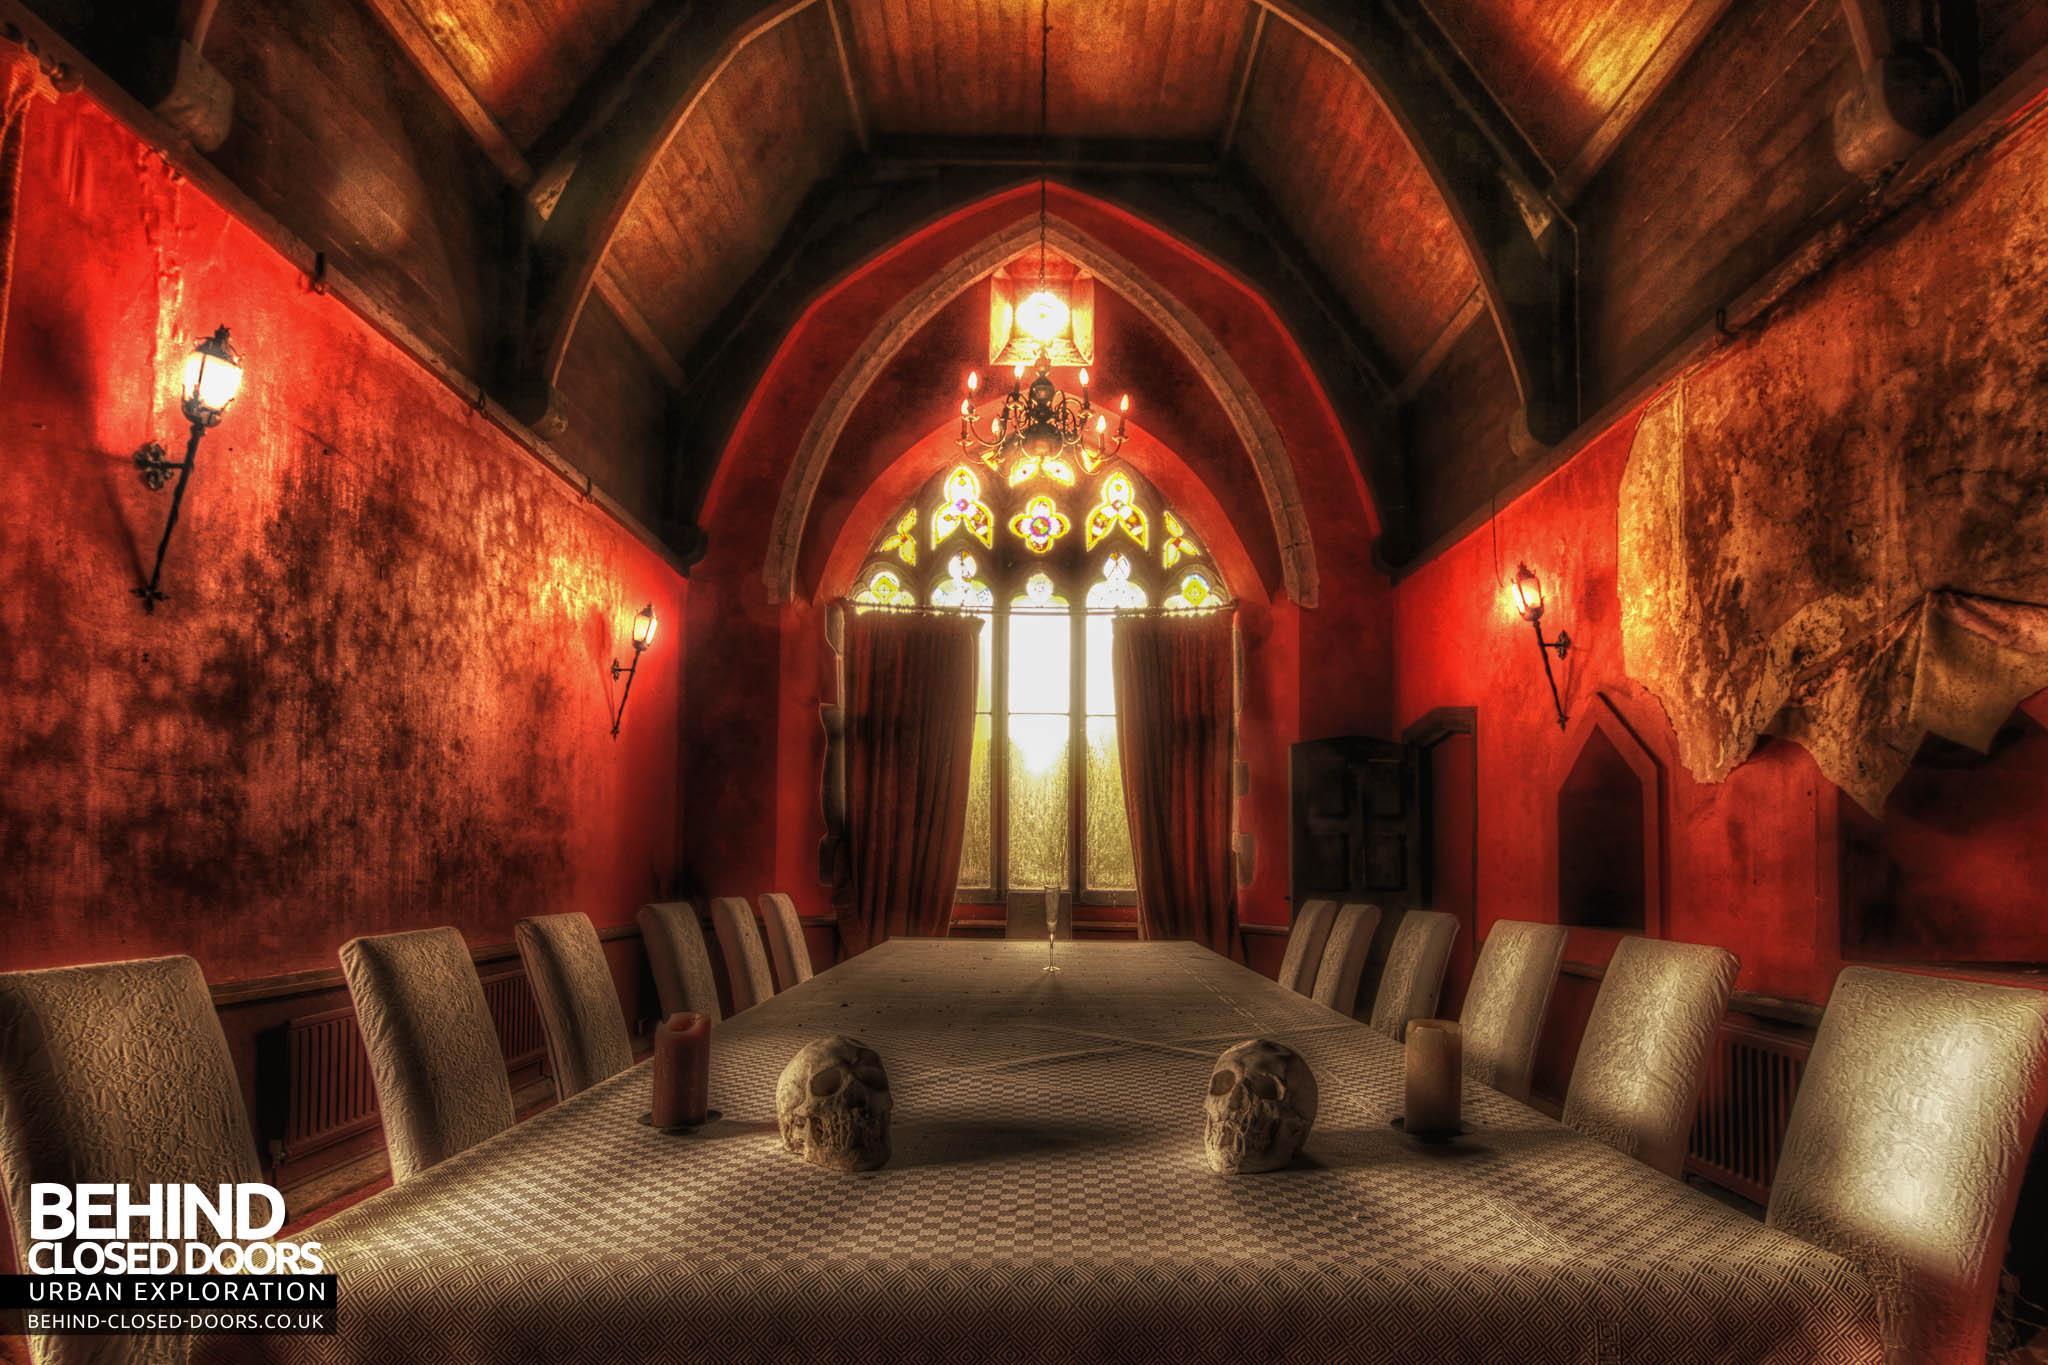 Kestrel Court - The Grand Dining Hall